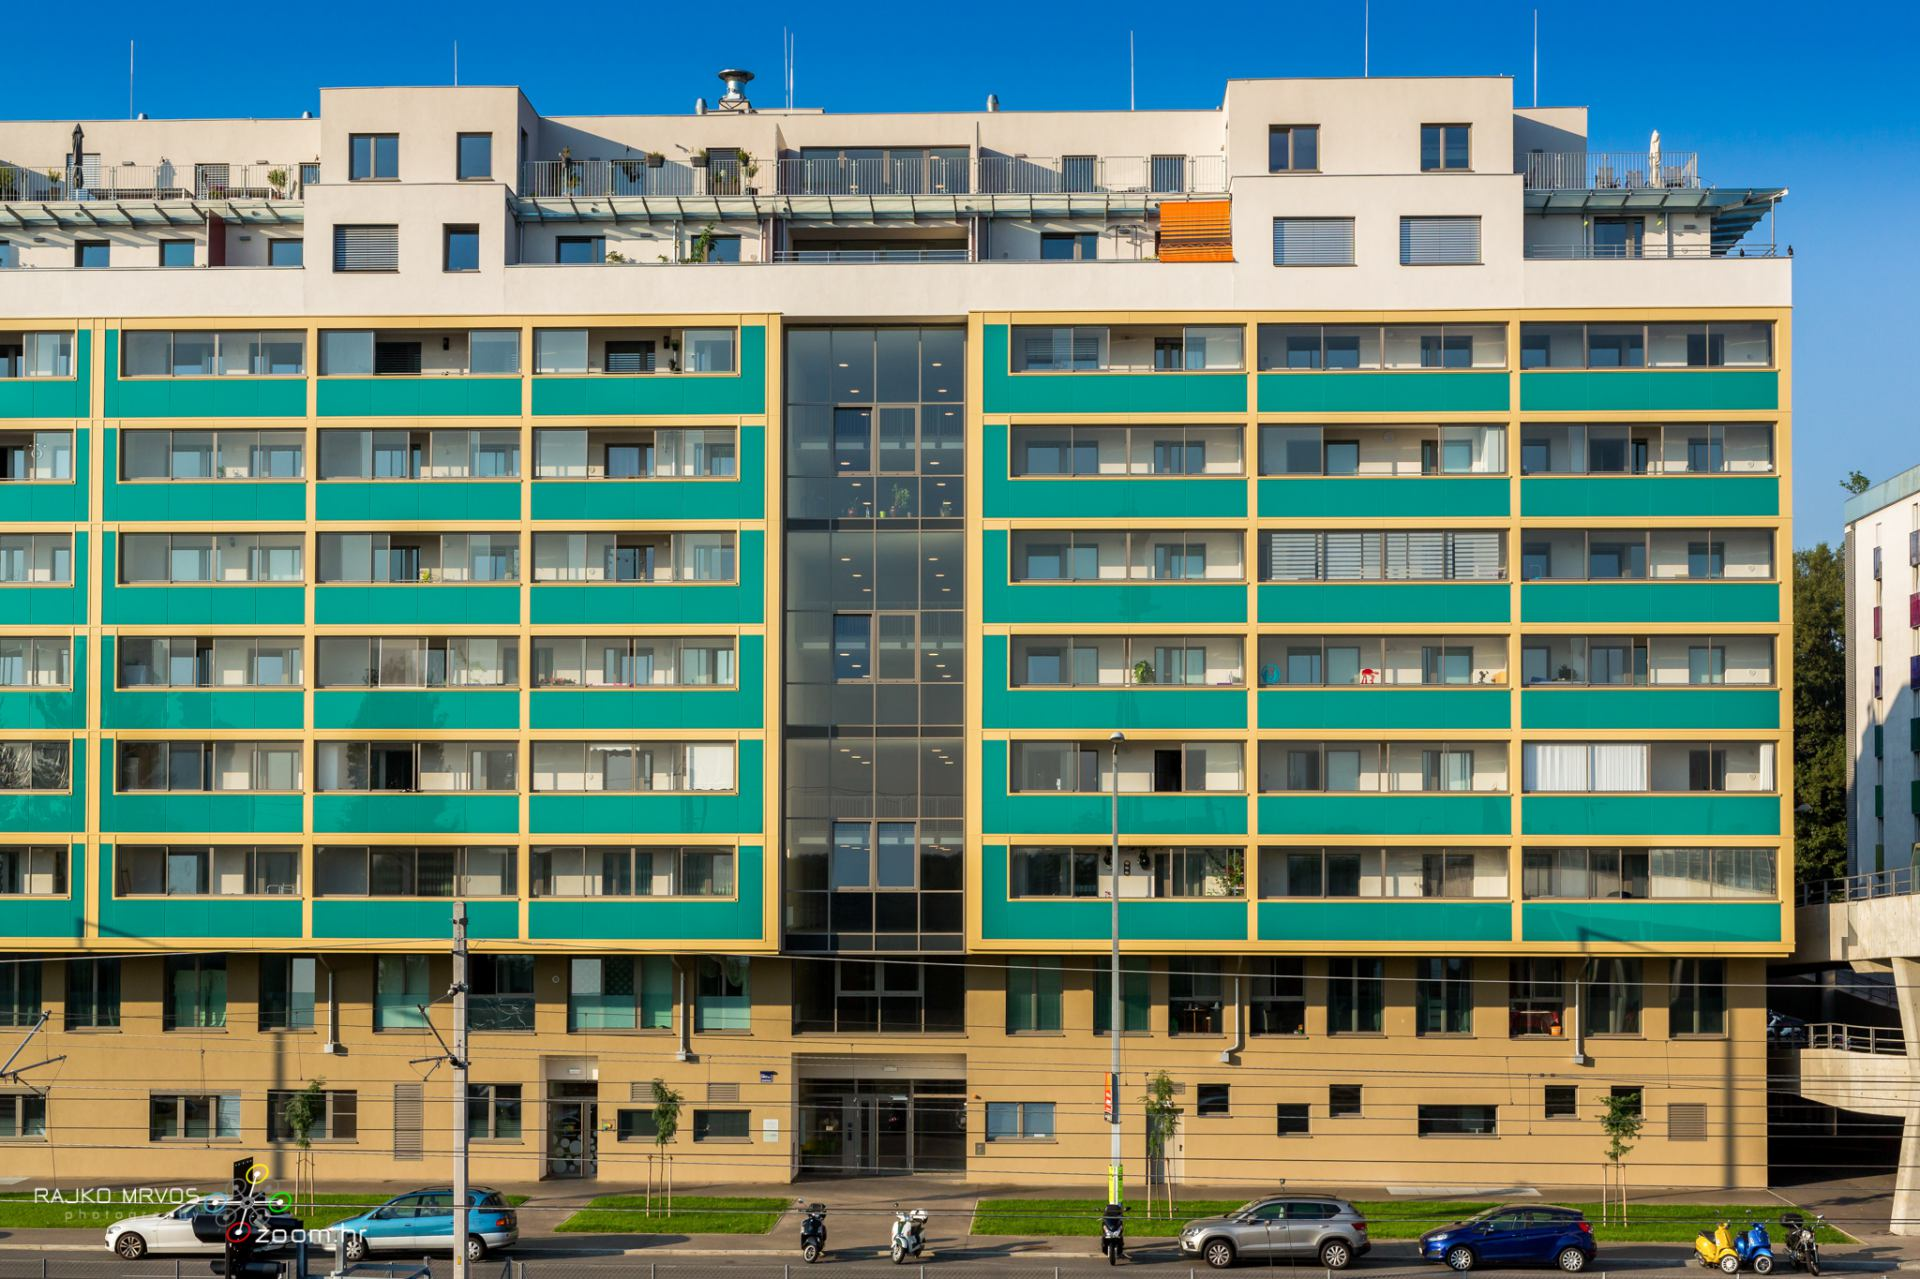 fotografiranje-interijera-fotograf-eksterijera-apartmana-vila-kuca-apartman-Beč-1